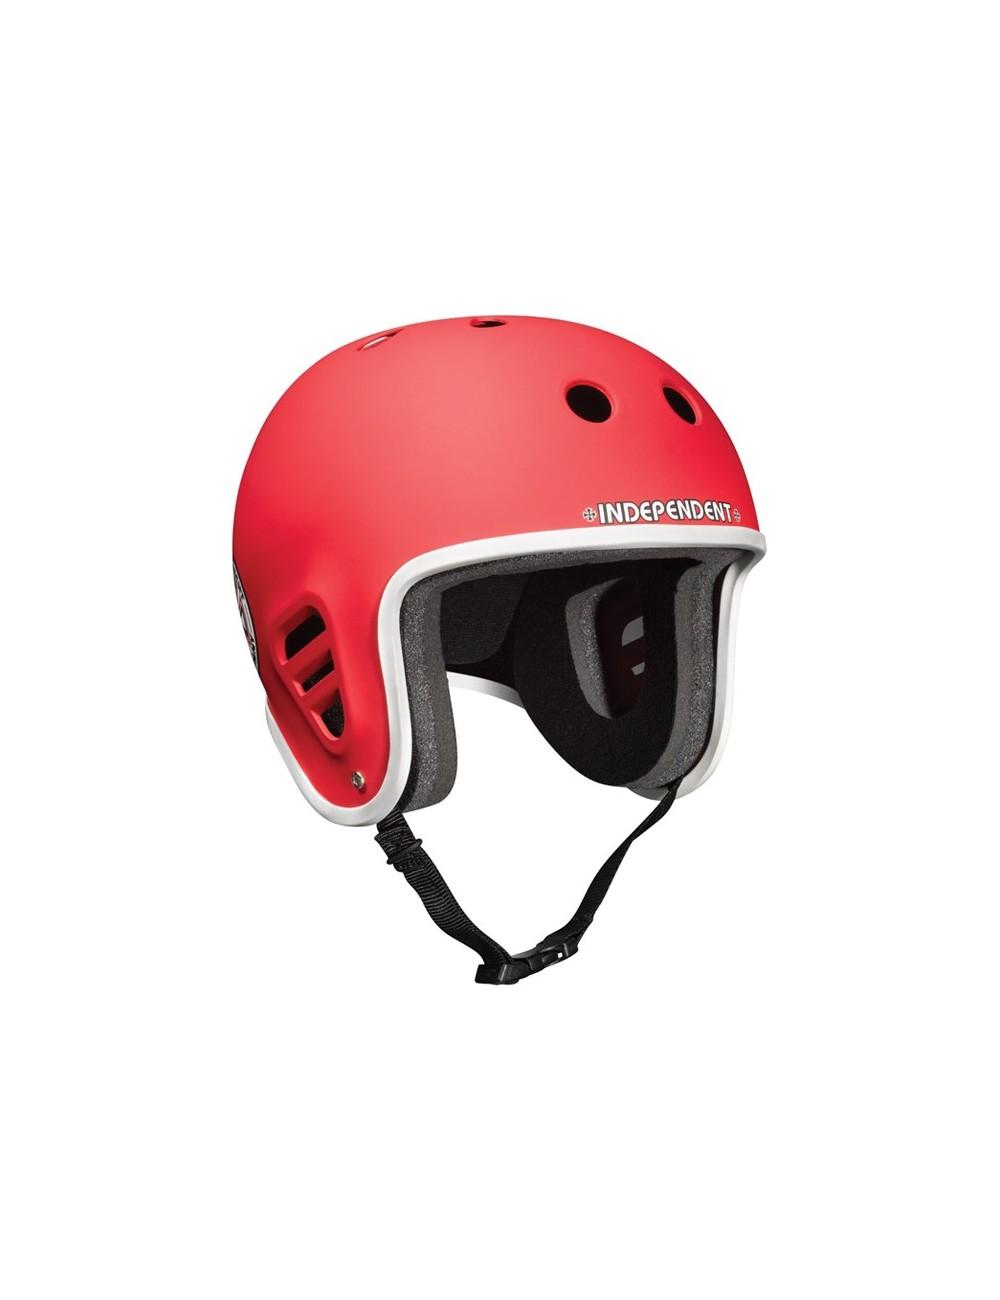 Pro-Tec Classic Independent Collab Full Cut Helmet